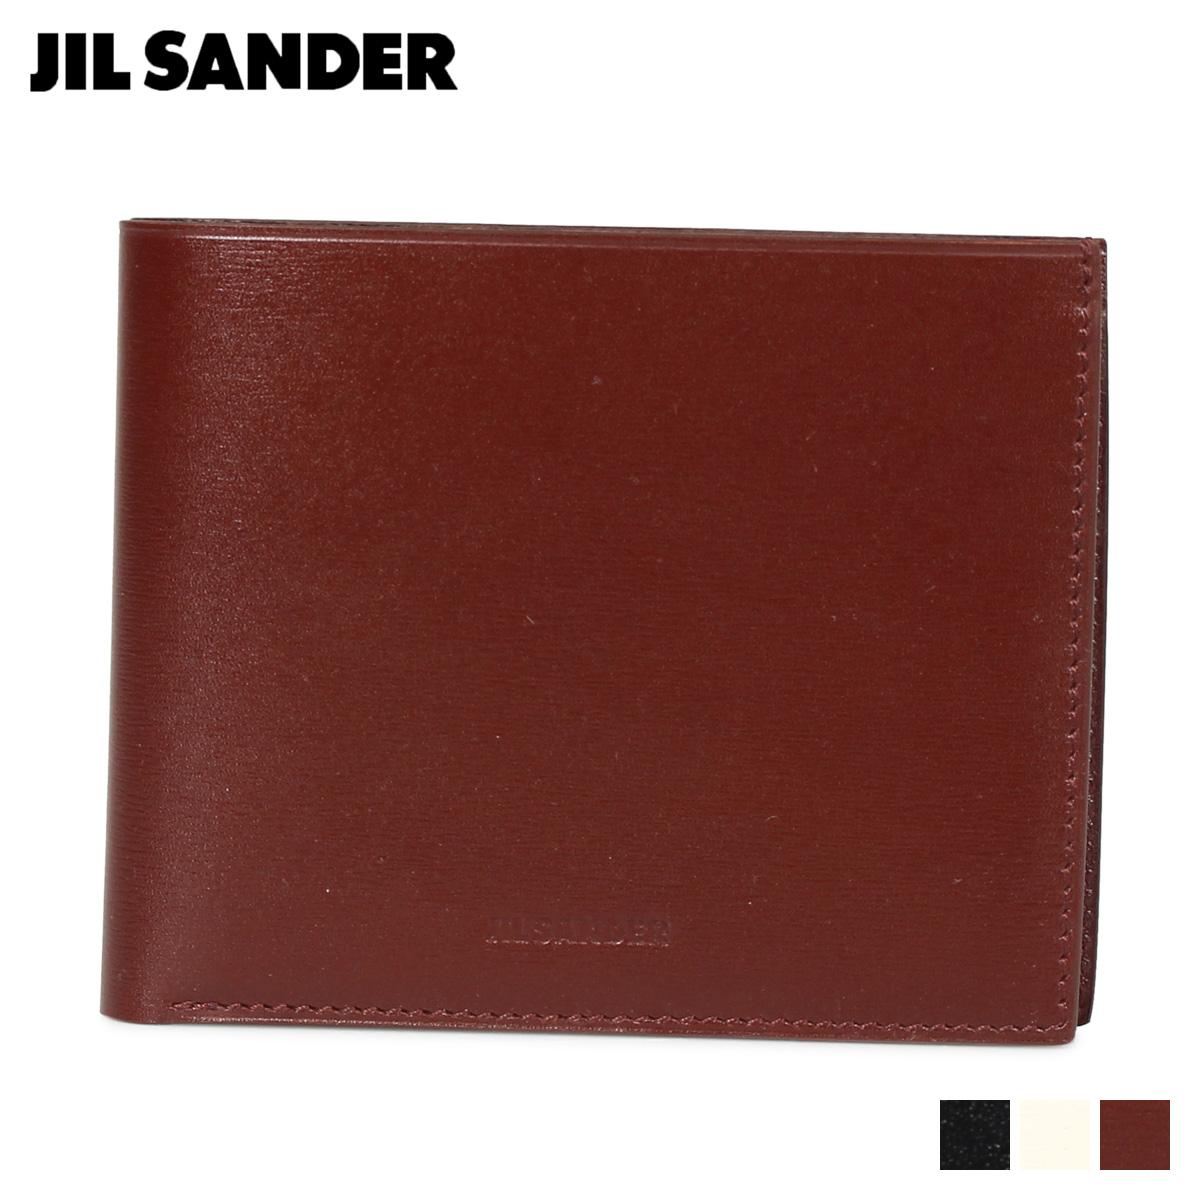 JIL SANDER ZIP POCKET WALLET ジルサンダー 財布 二つ折り財布 メンズ ブラック ホワイト ブラウン 黒 白 MPS00015N [11/15 新入荷]